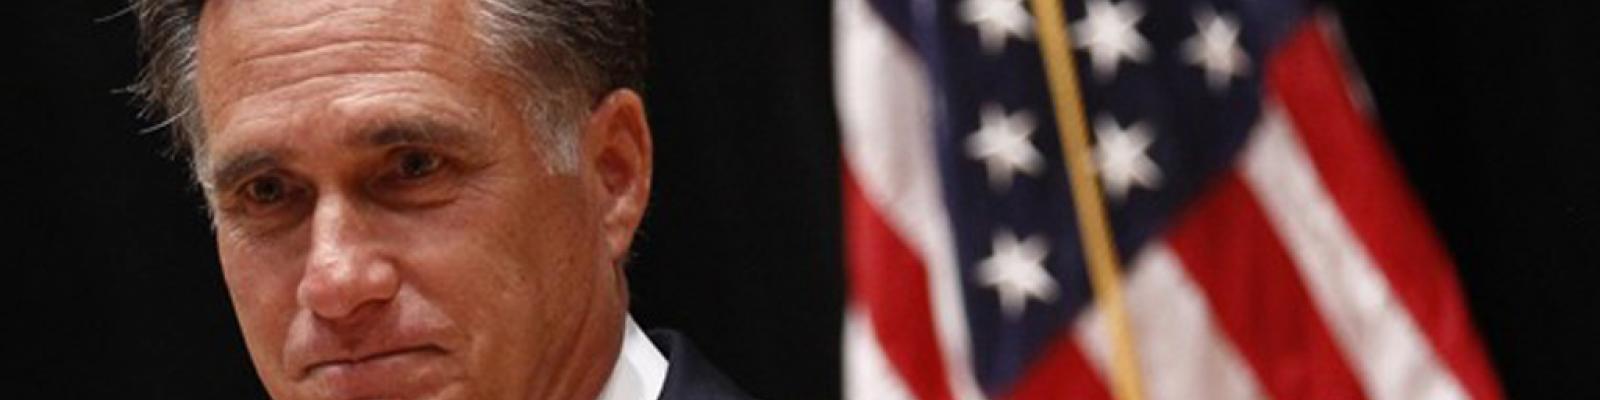 Andrew Nagorski on Romney's Visit to Poland